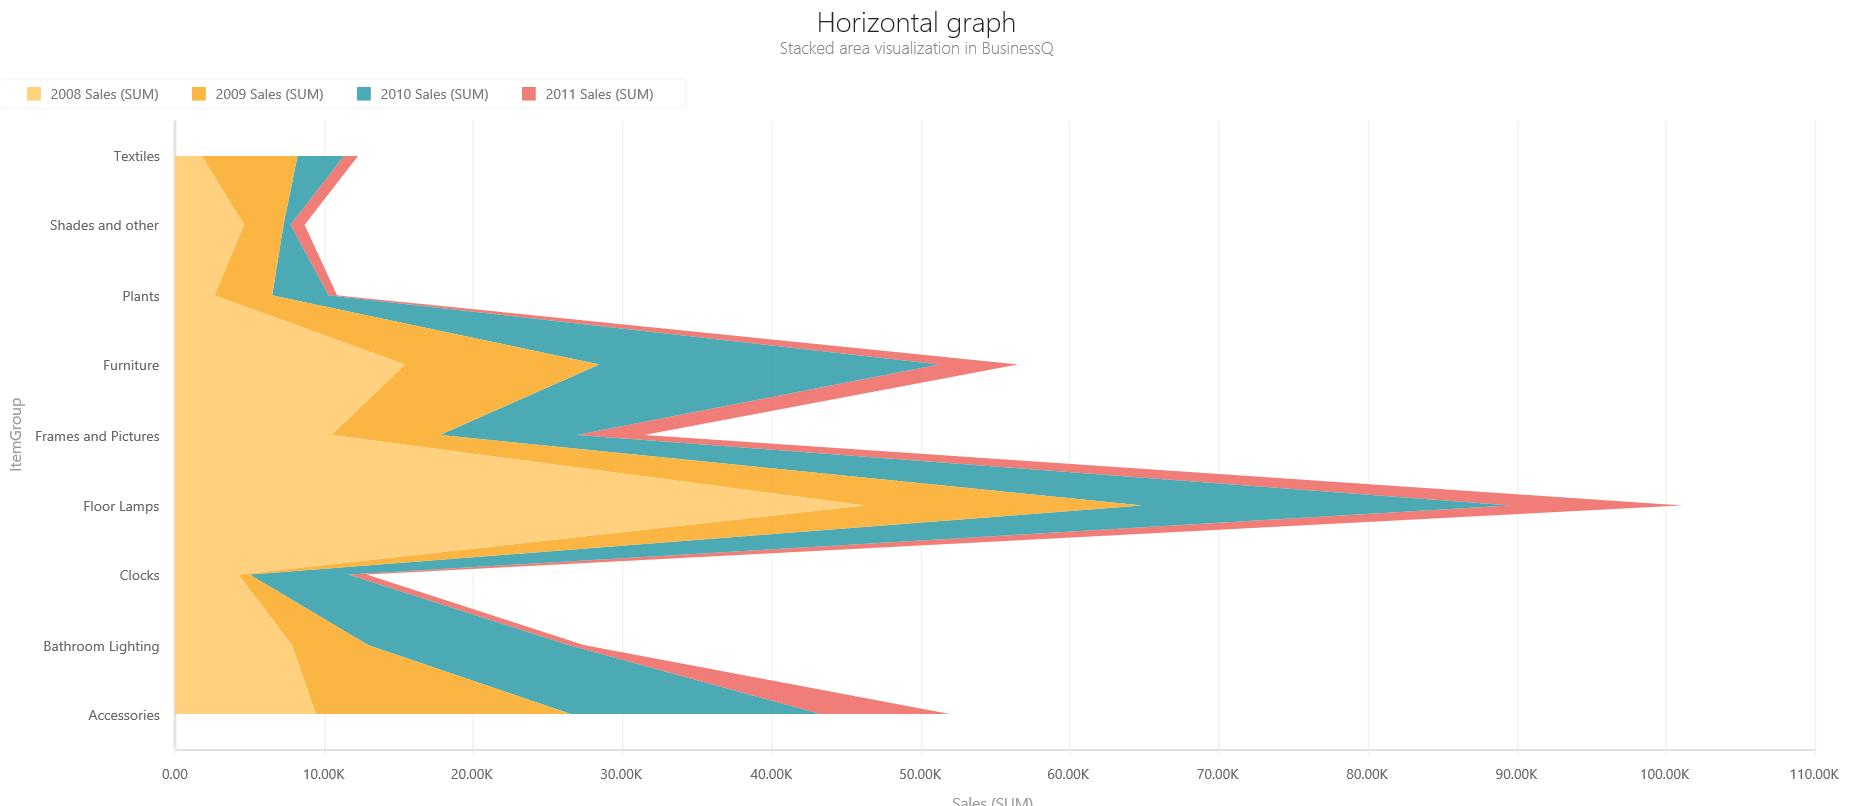 BQ_Horizontal_graph_2_Horizontal_Stacked_Area